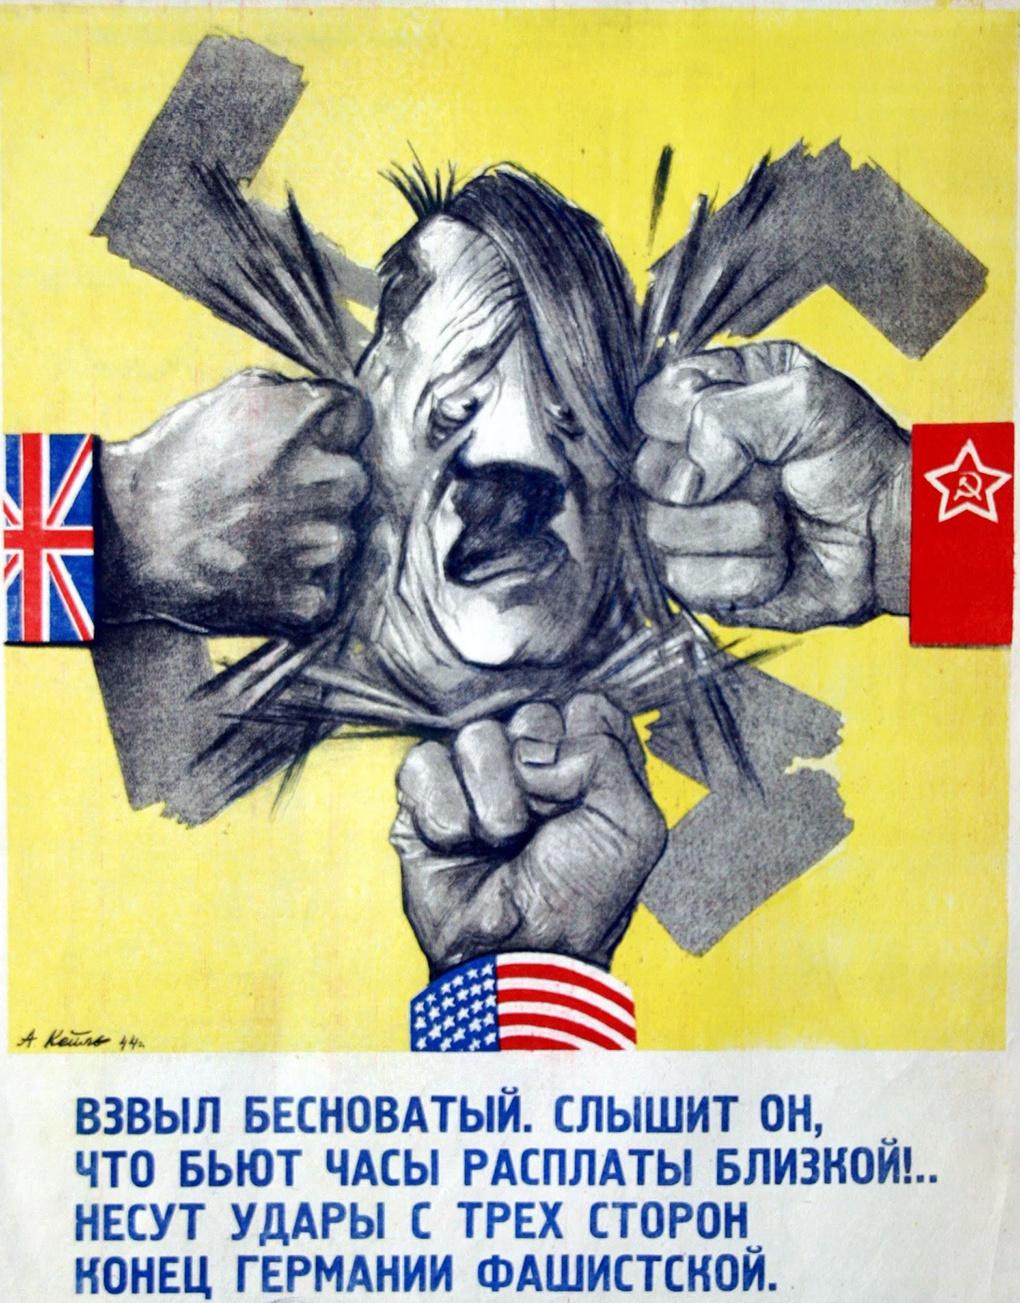 Плакат 1944 года художника Александра Кейля.